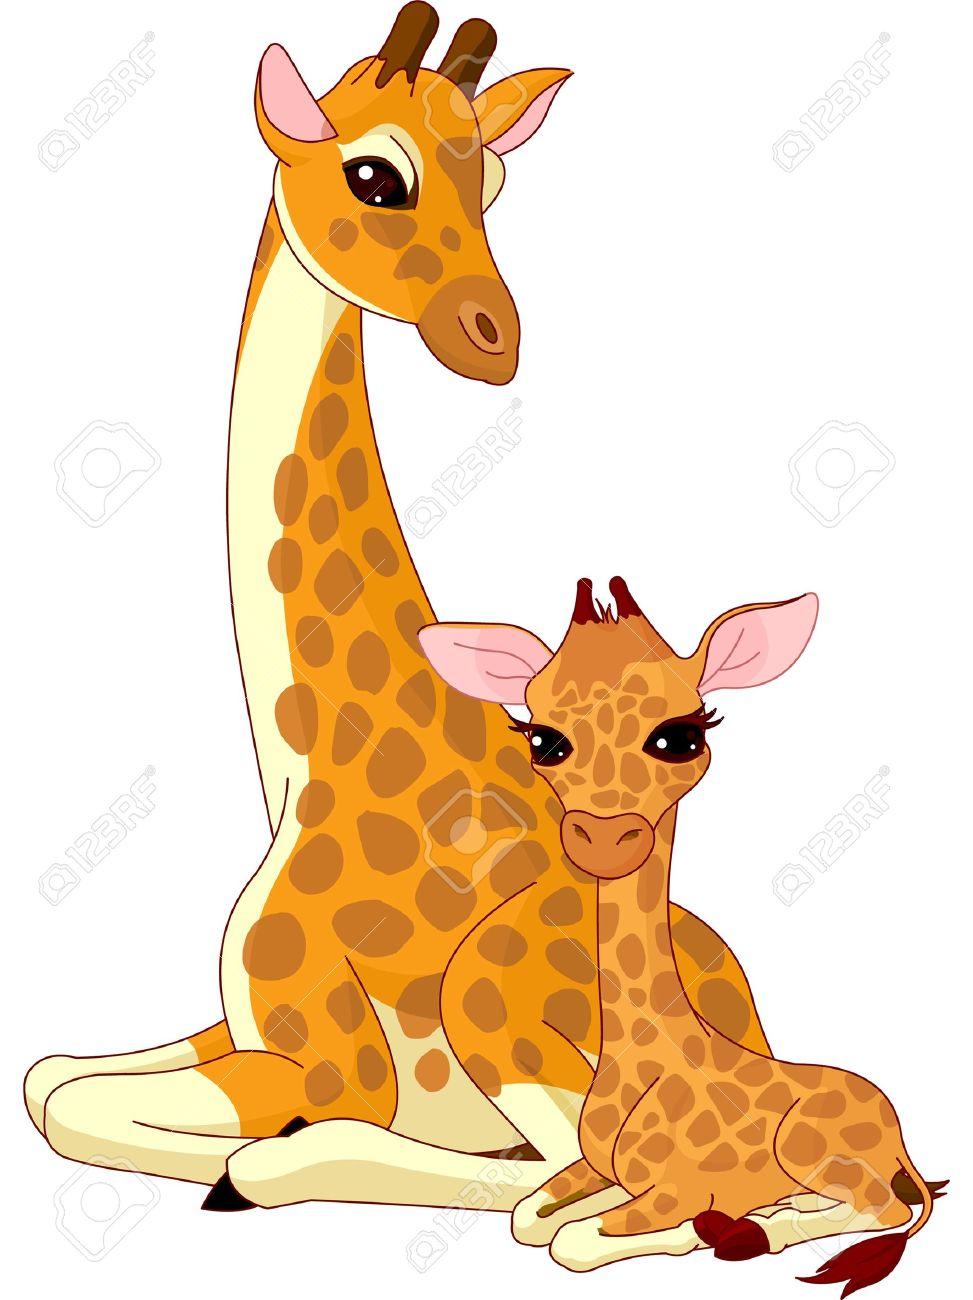 baby giraffe stock photos royalty free baby giraffe images and